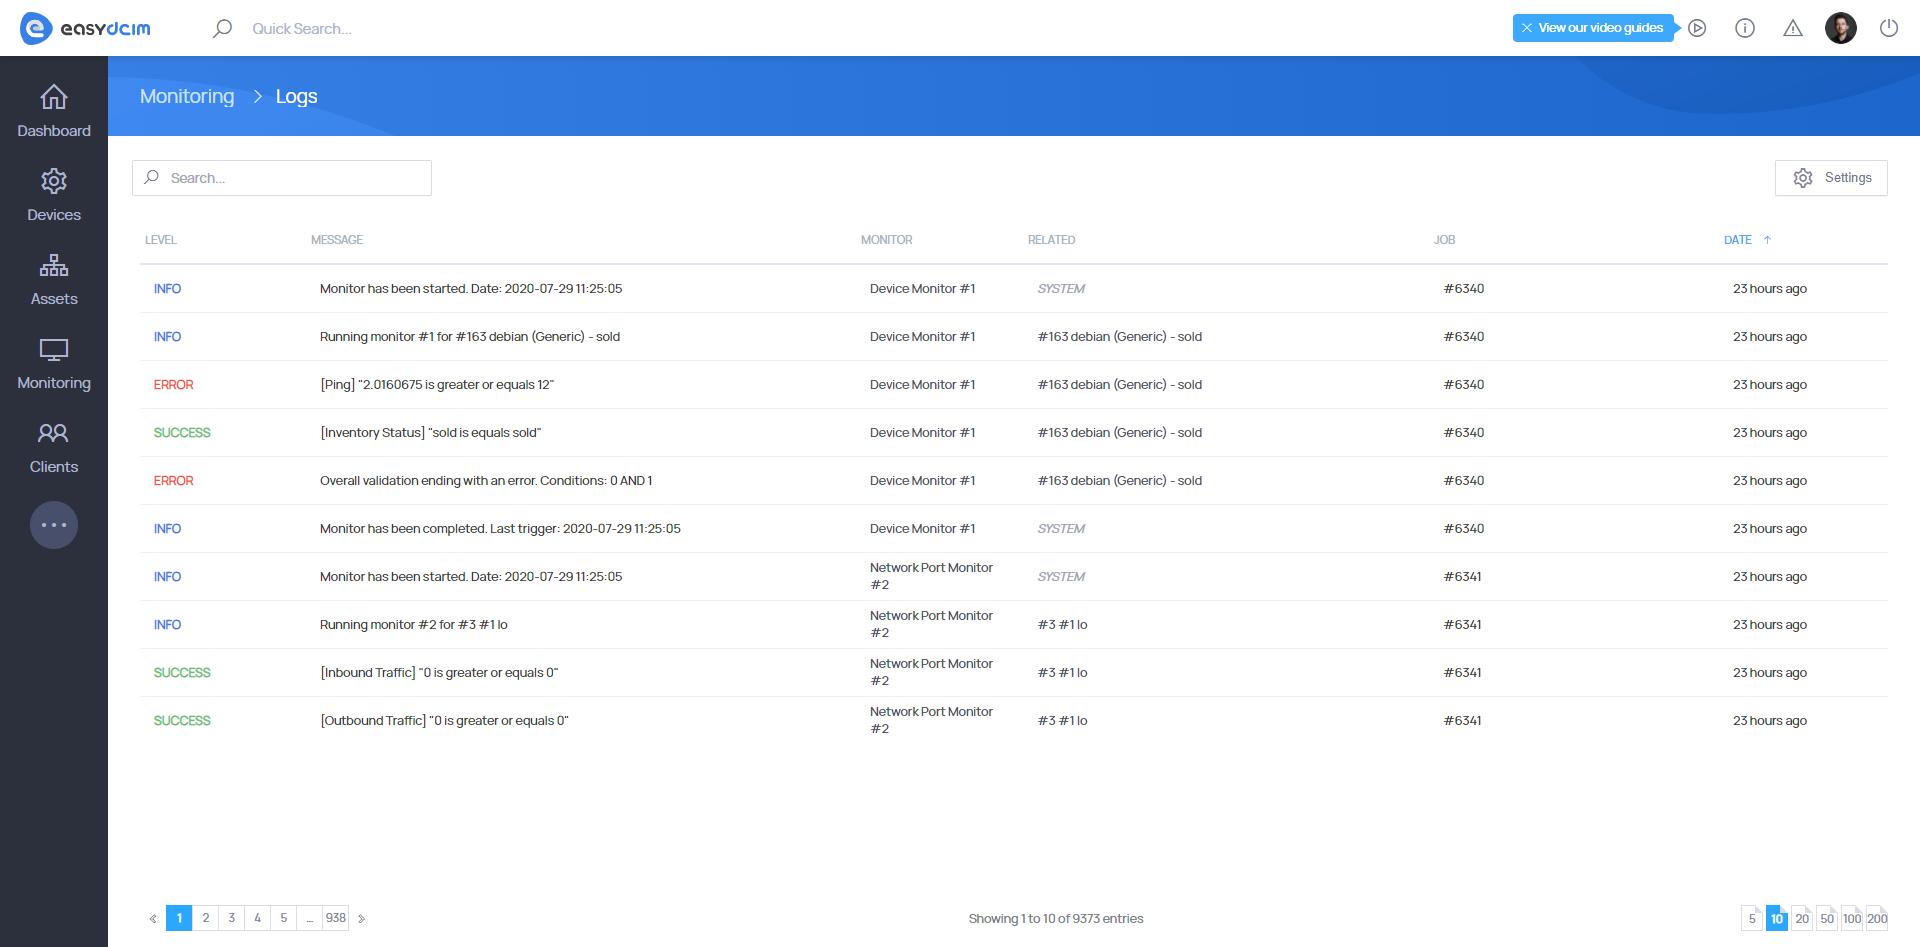 Advanced Monitoring Logs - EasyDCIM v1.7.0